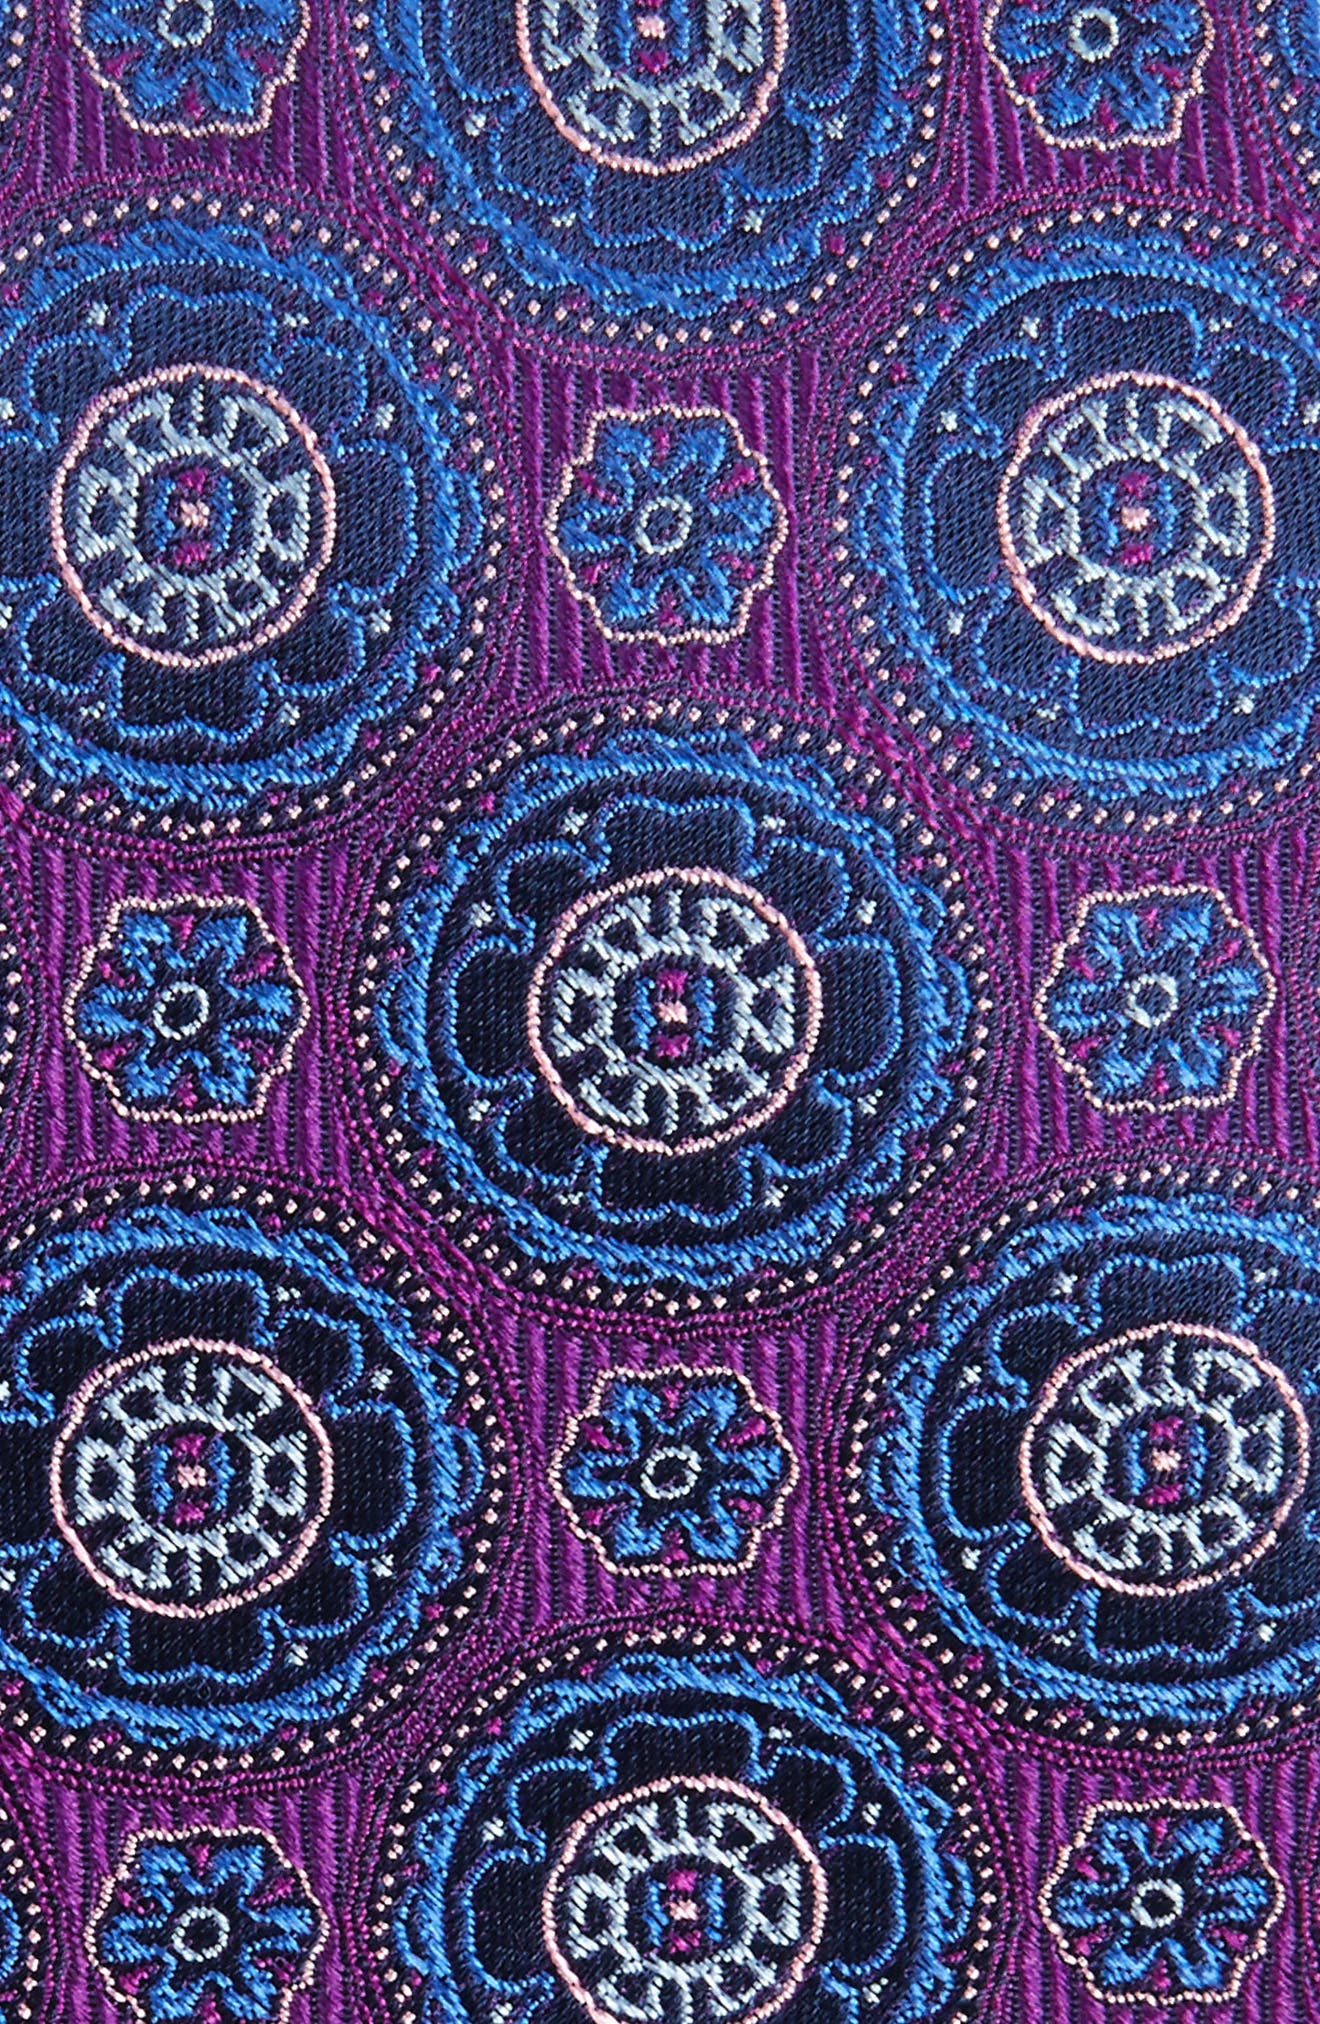 Kensington Medallion Silk Tie,                             Alternate thumbnail 2, color,                             Purple